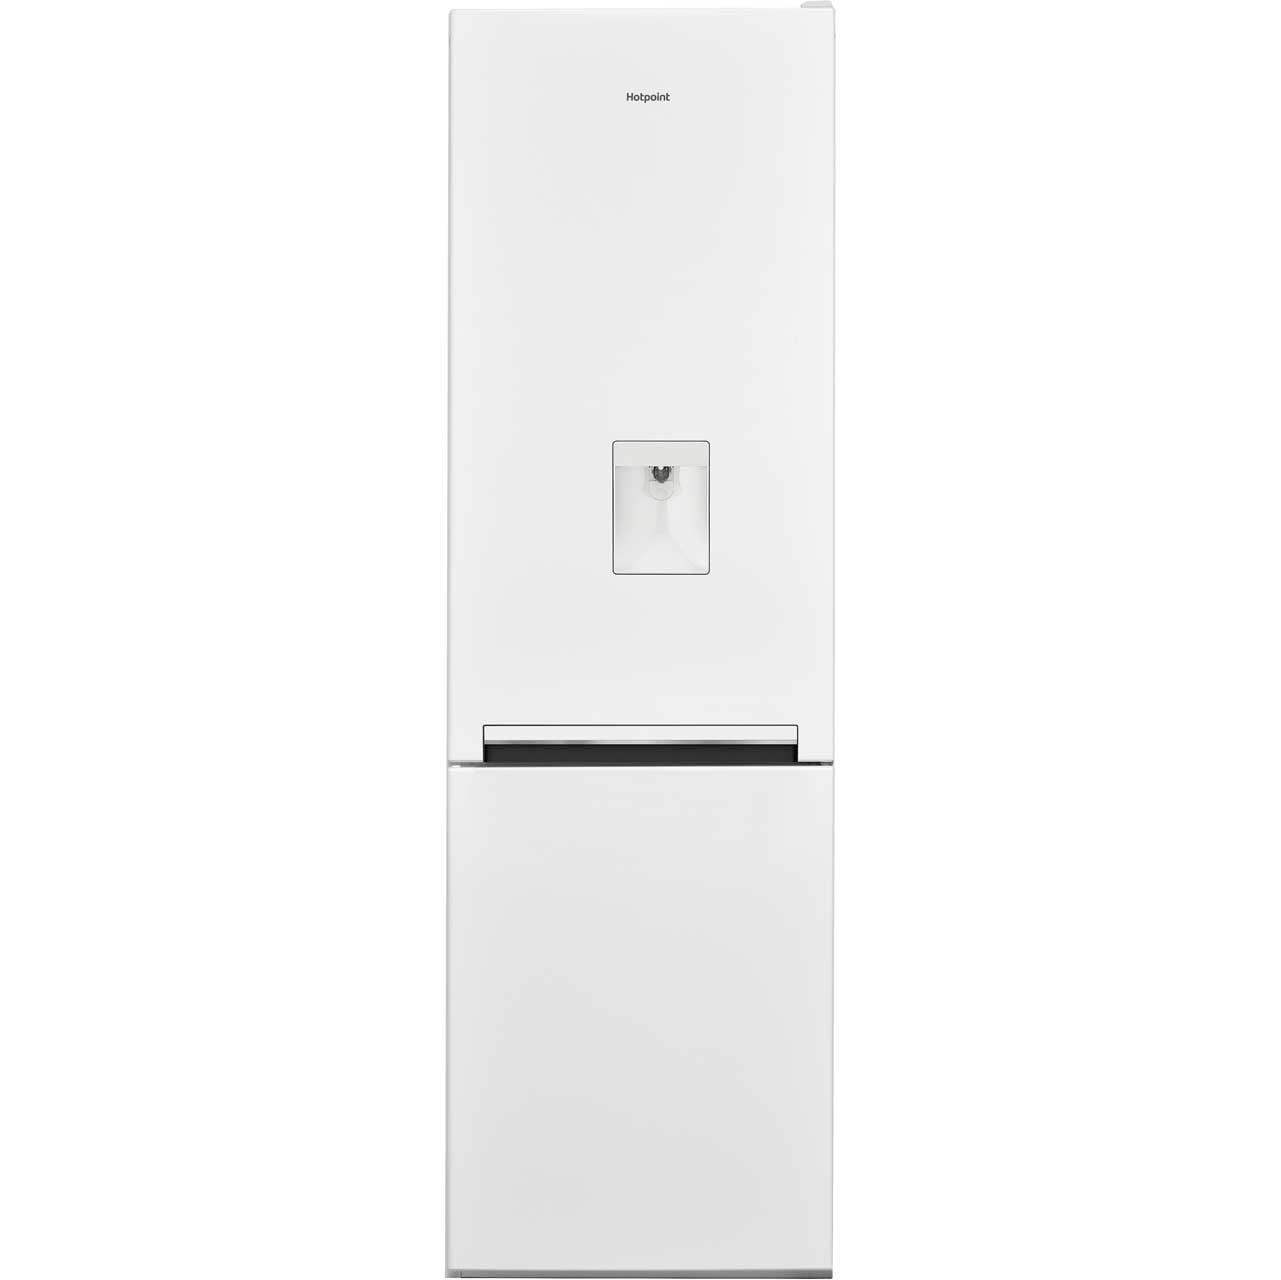 Hotpoint H8A1EWWTD Free Standing Fridge Freezer in White